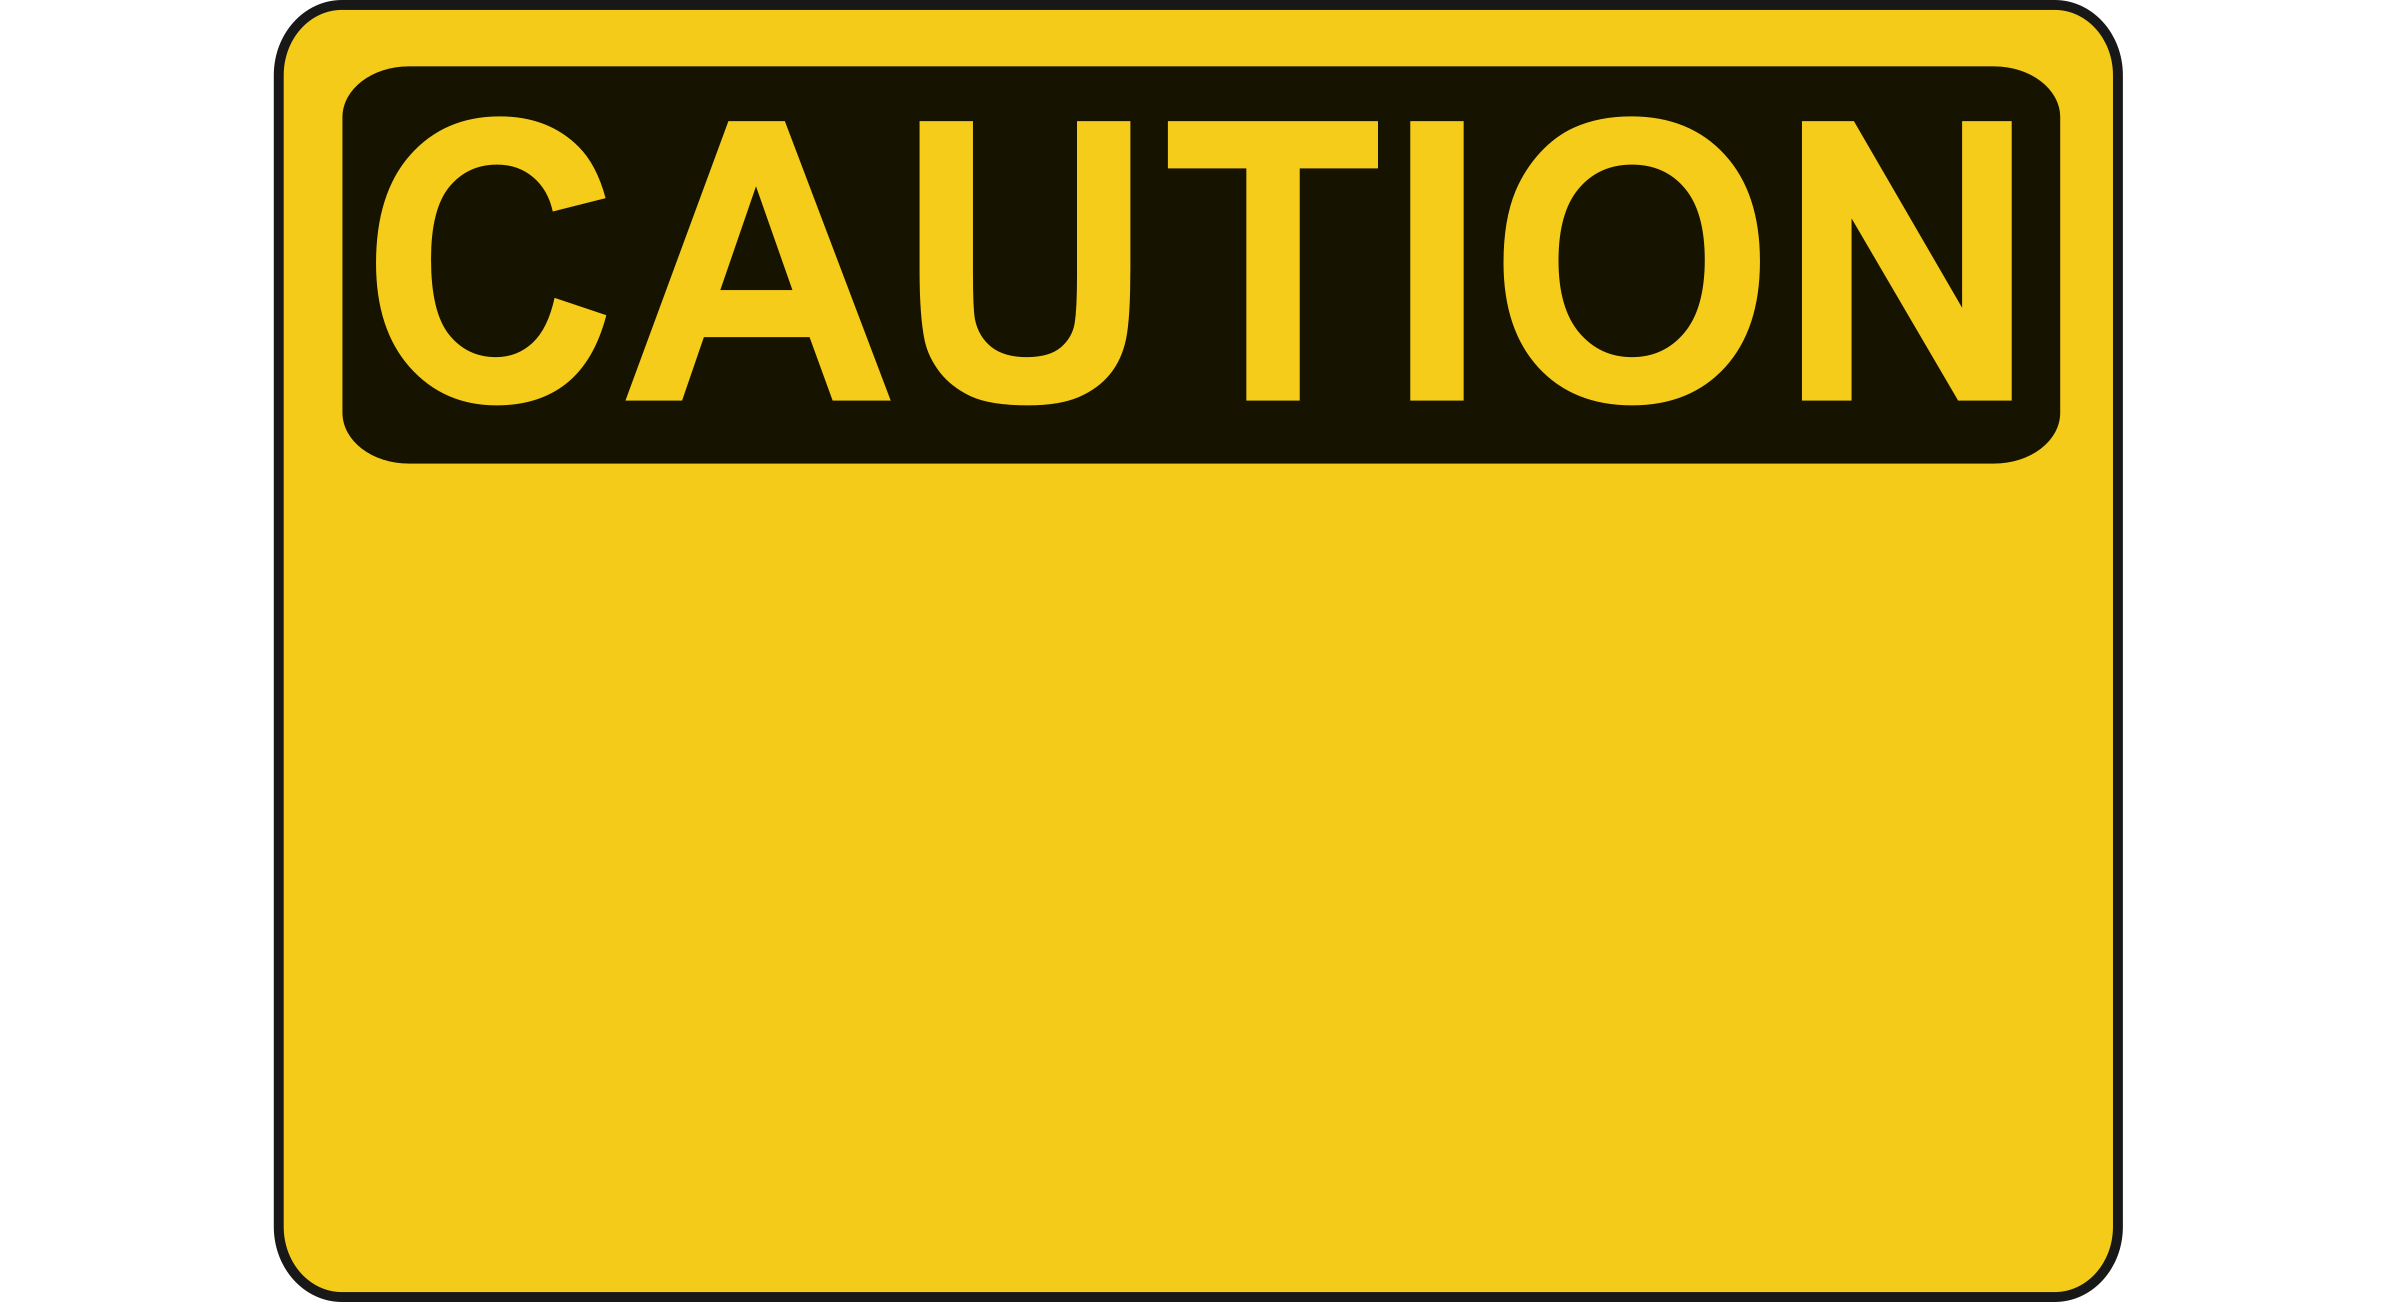 Blank big image png. Caution clipart transparent